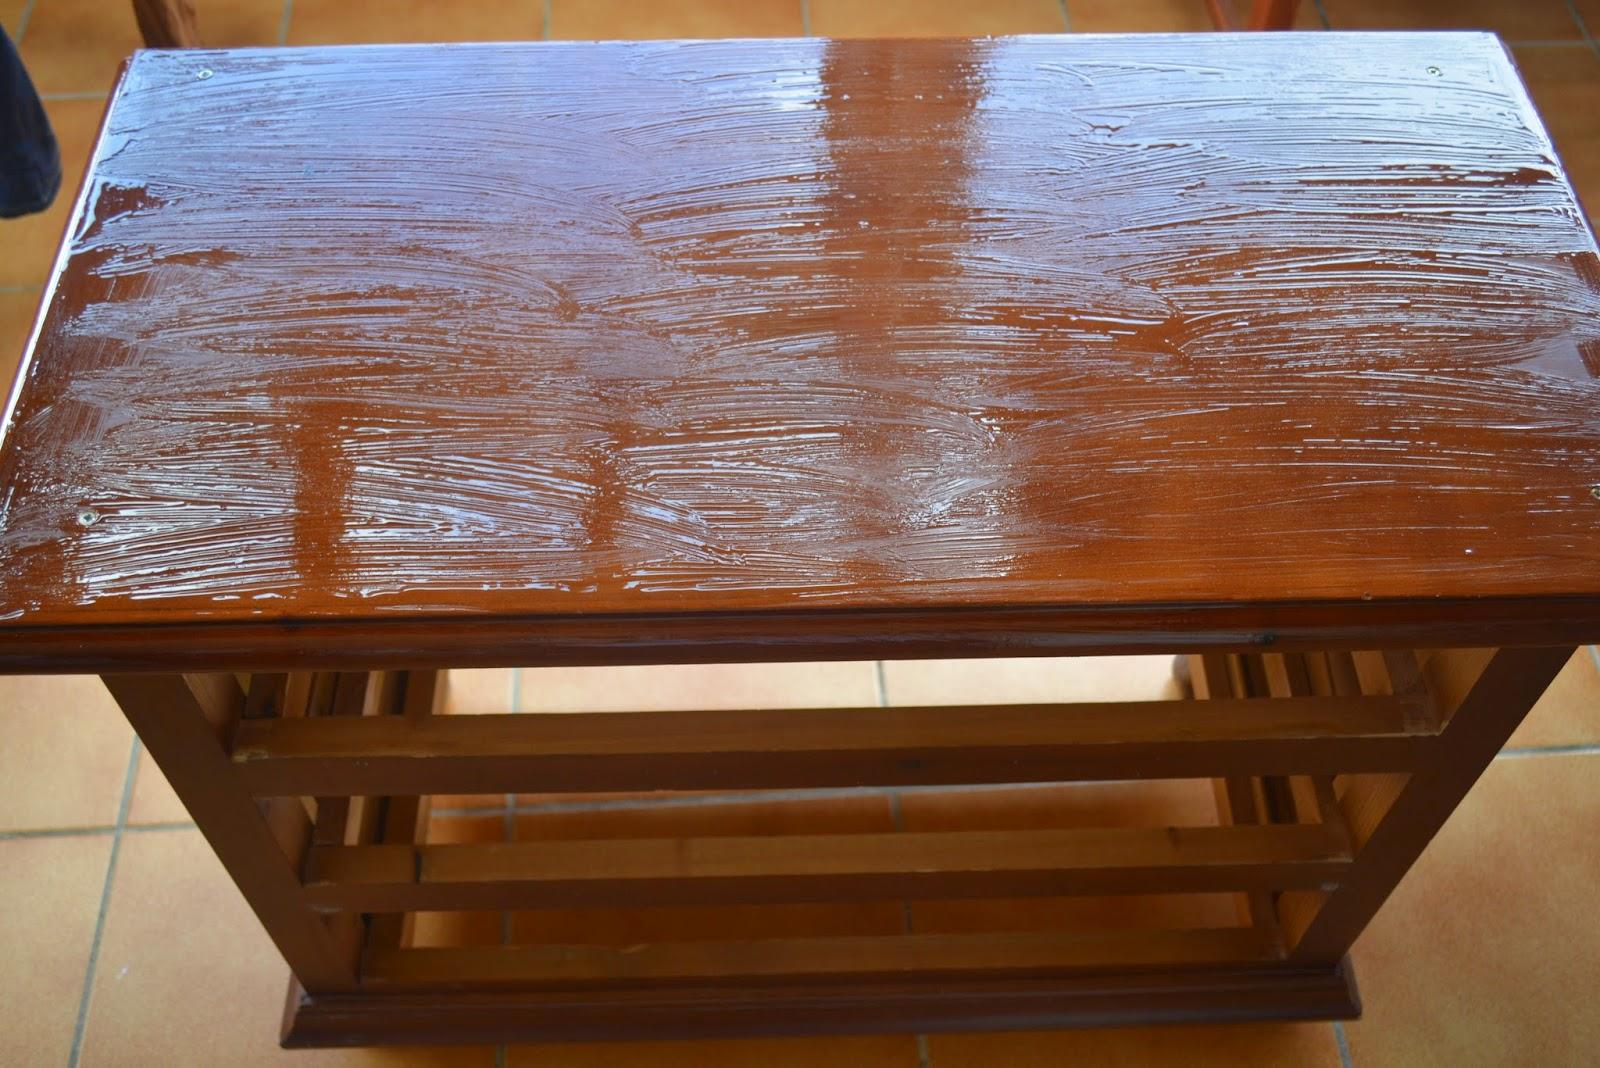 MERMELADA DE TOMATE Mueble restaurado